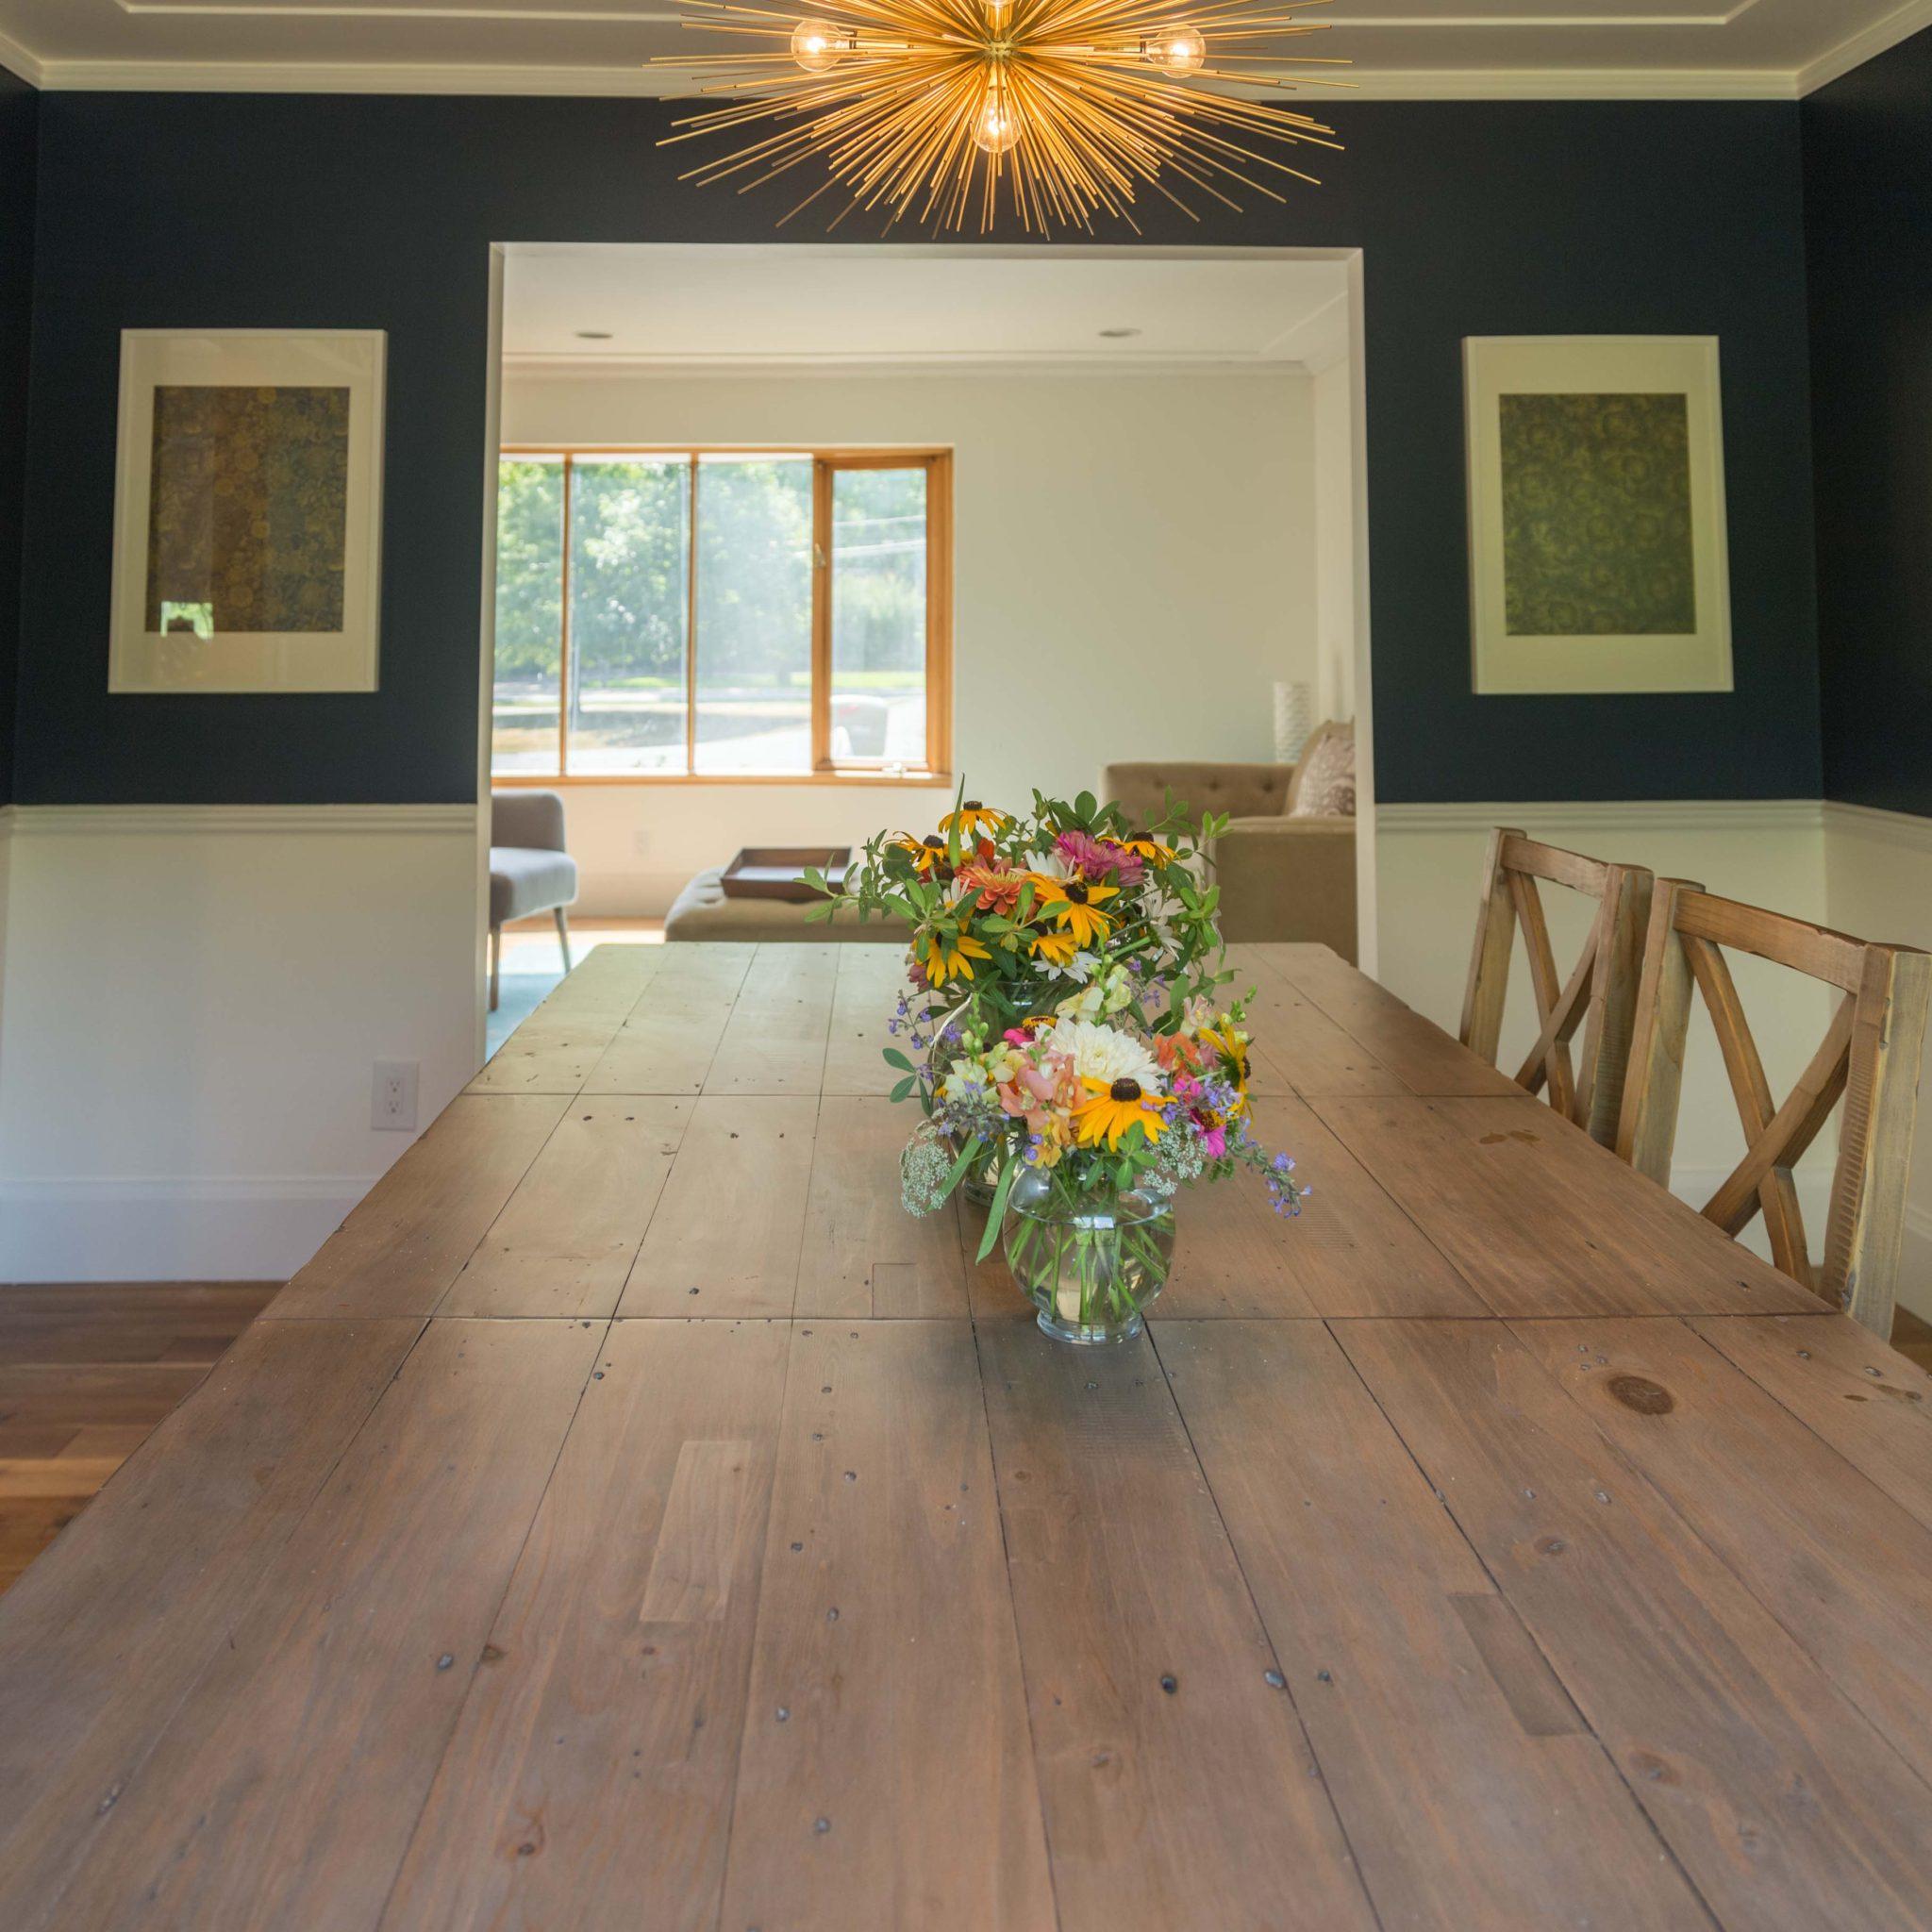 our new dining room on allweareblog.com